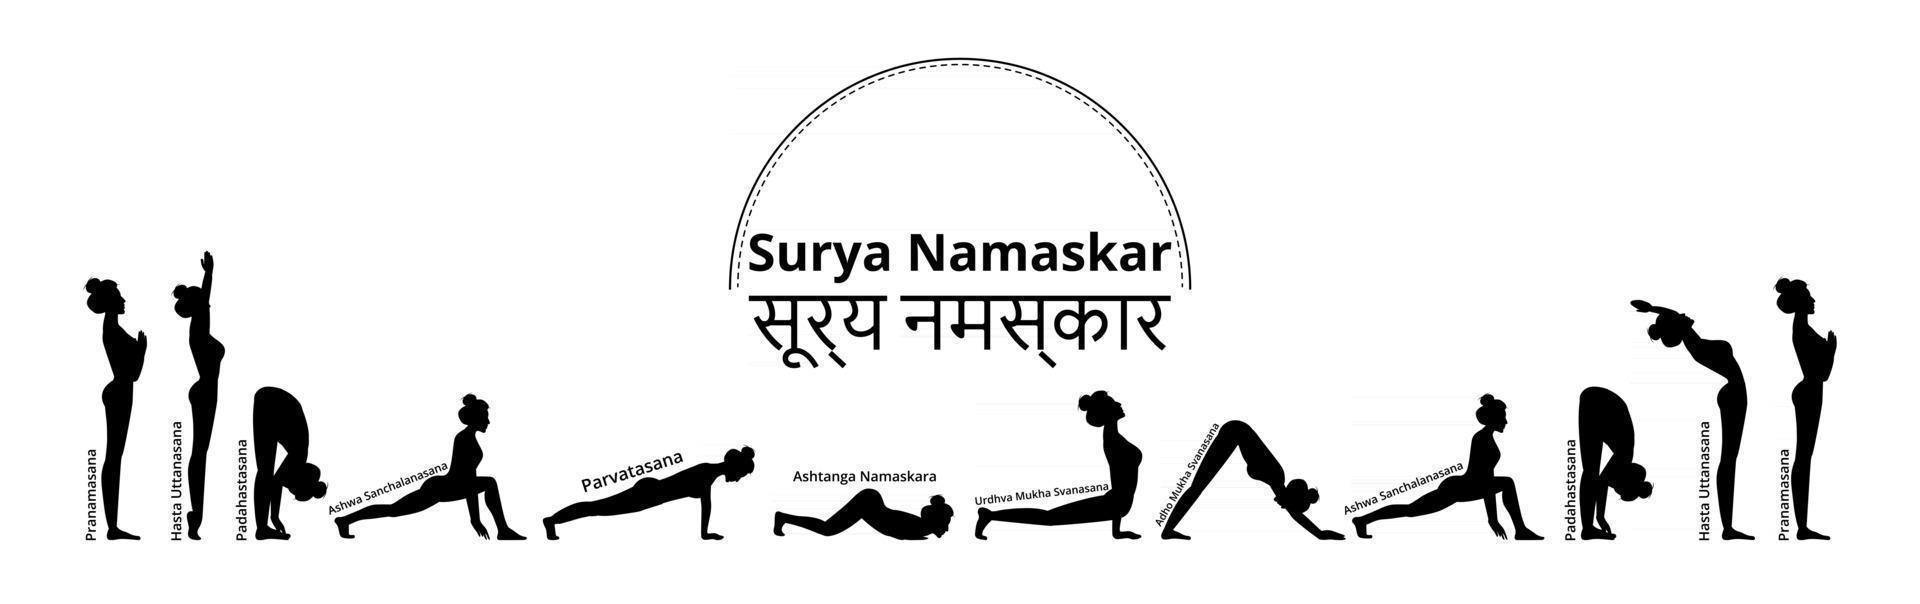 Silhouette fit women practicing yoga sun salutation complex long ...